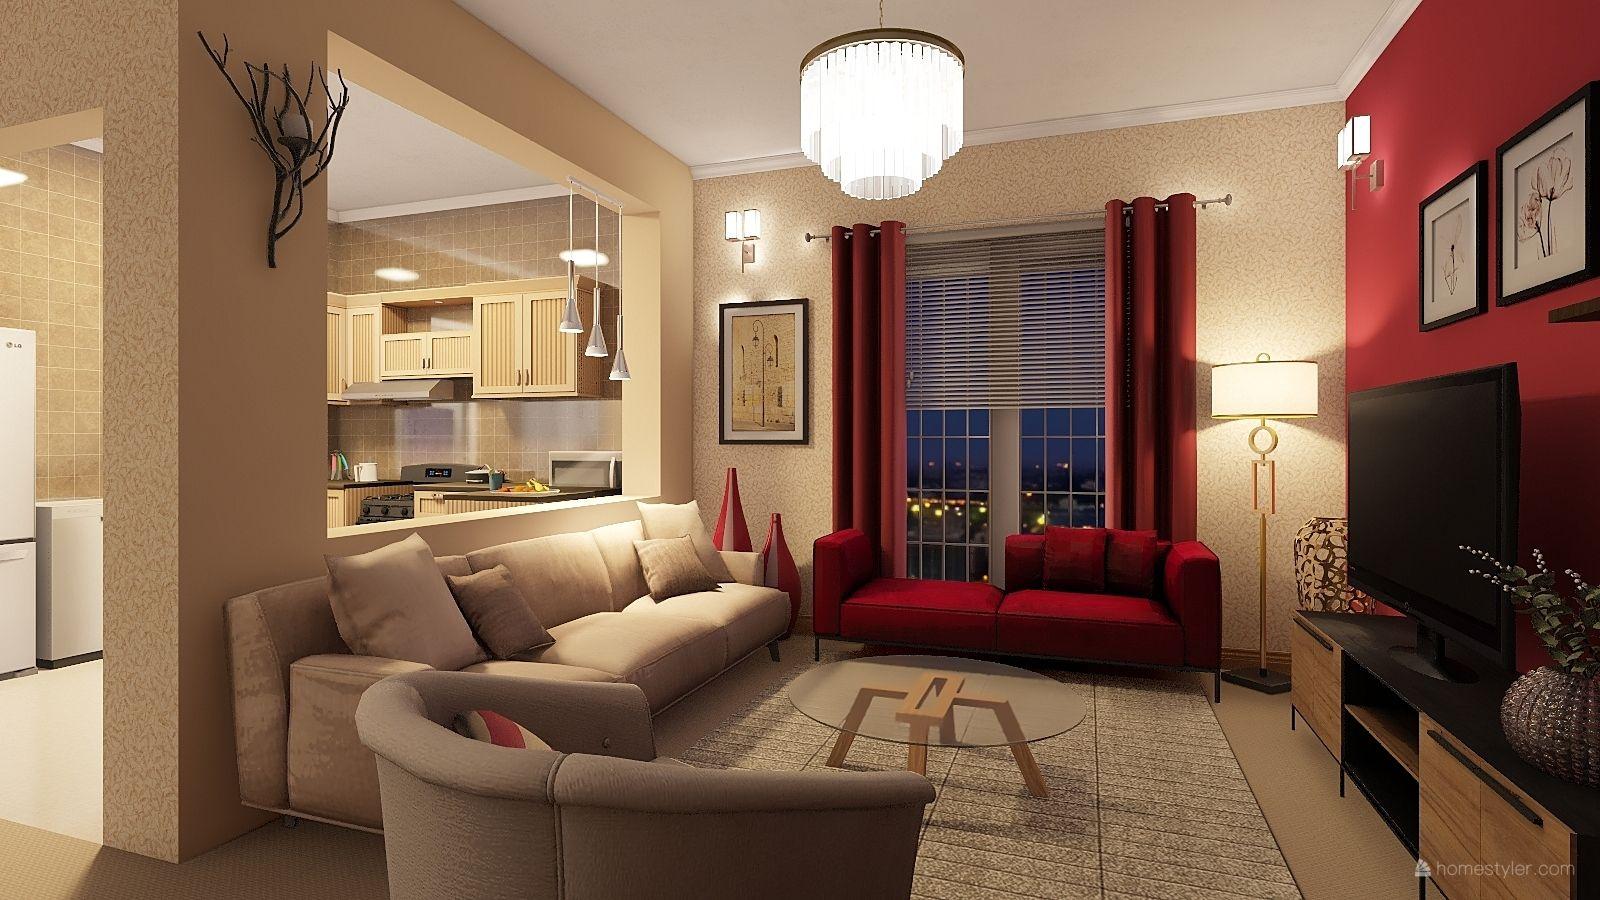 Living Room Design By Srishti Katoch 3d Home Design Software